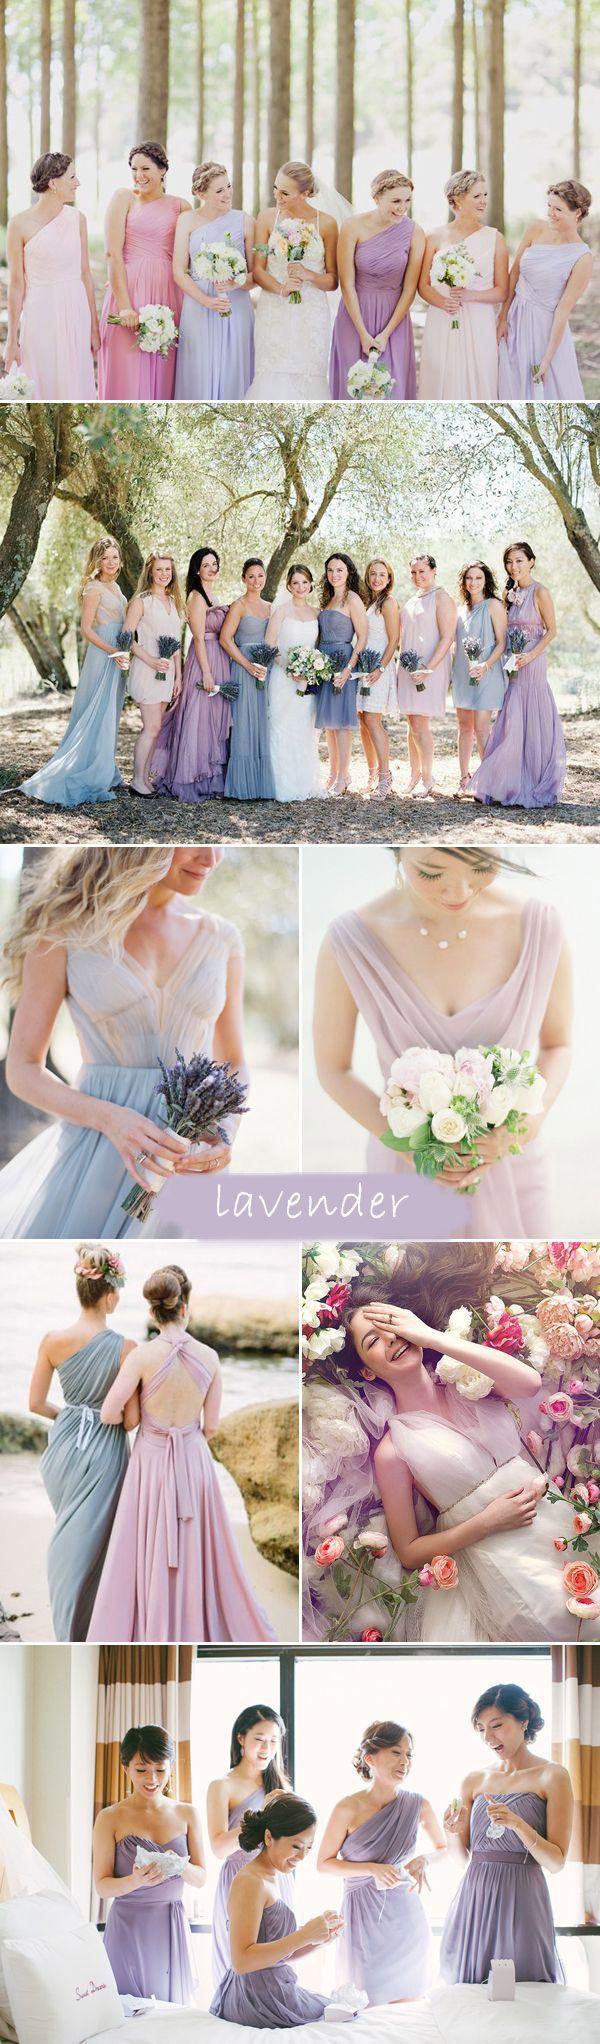 2015 trending shades of purple lavender bridesmaid dresses